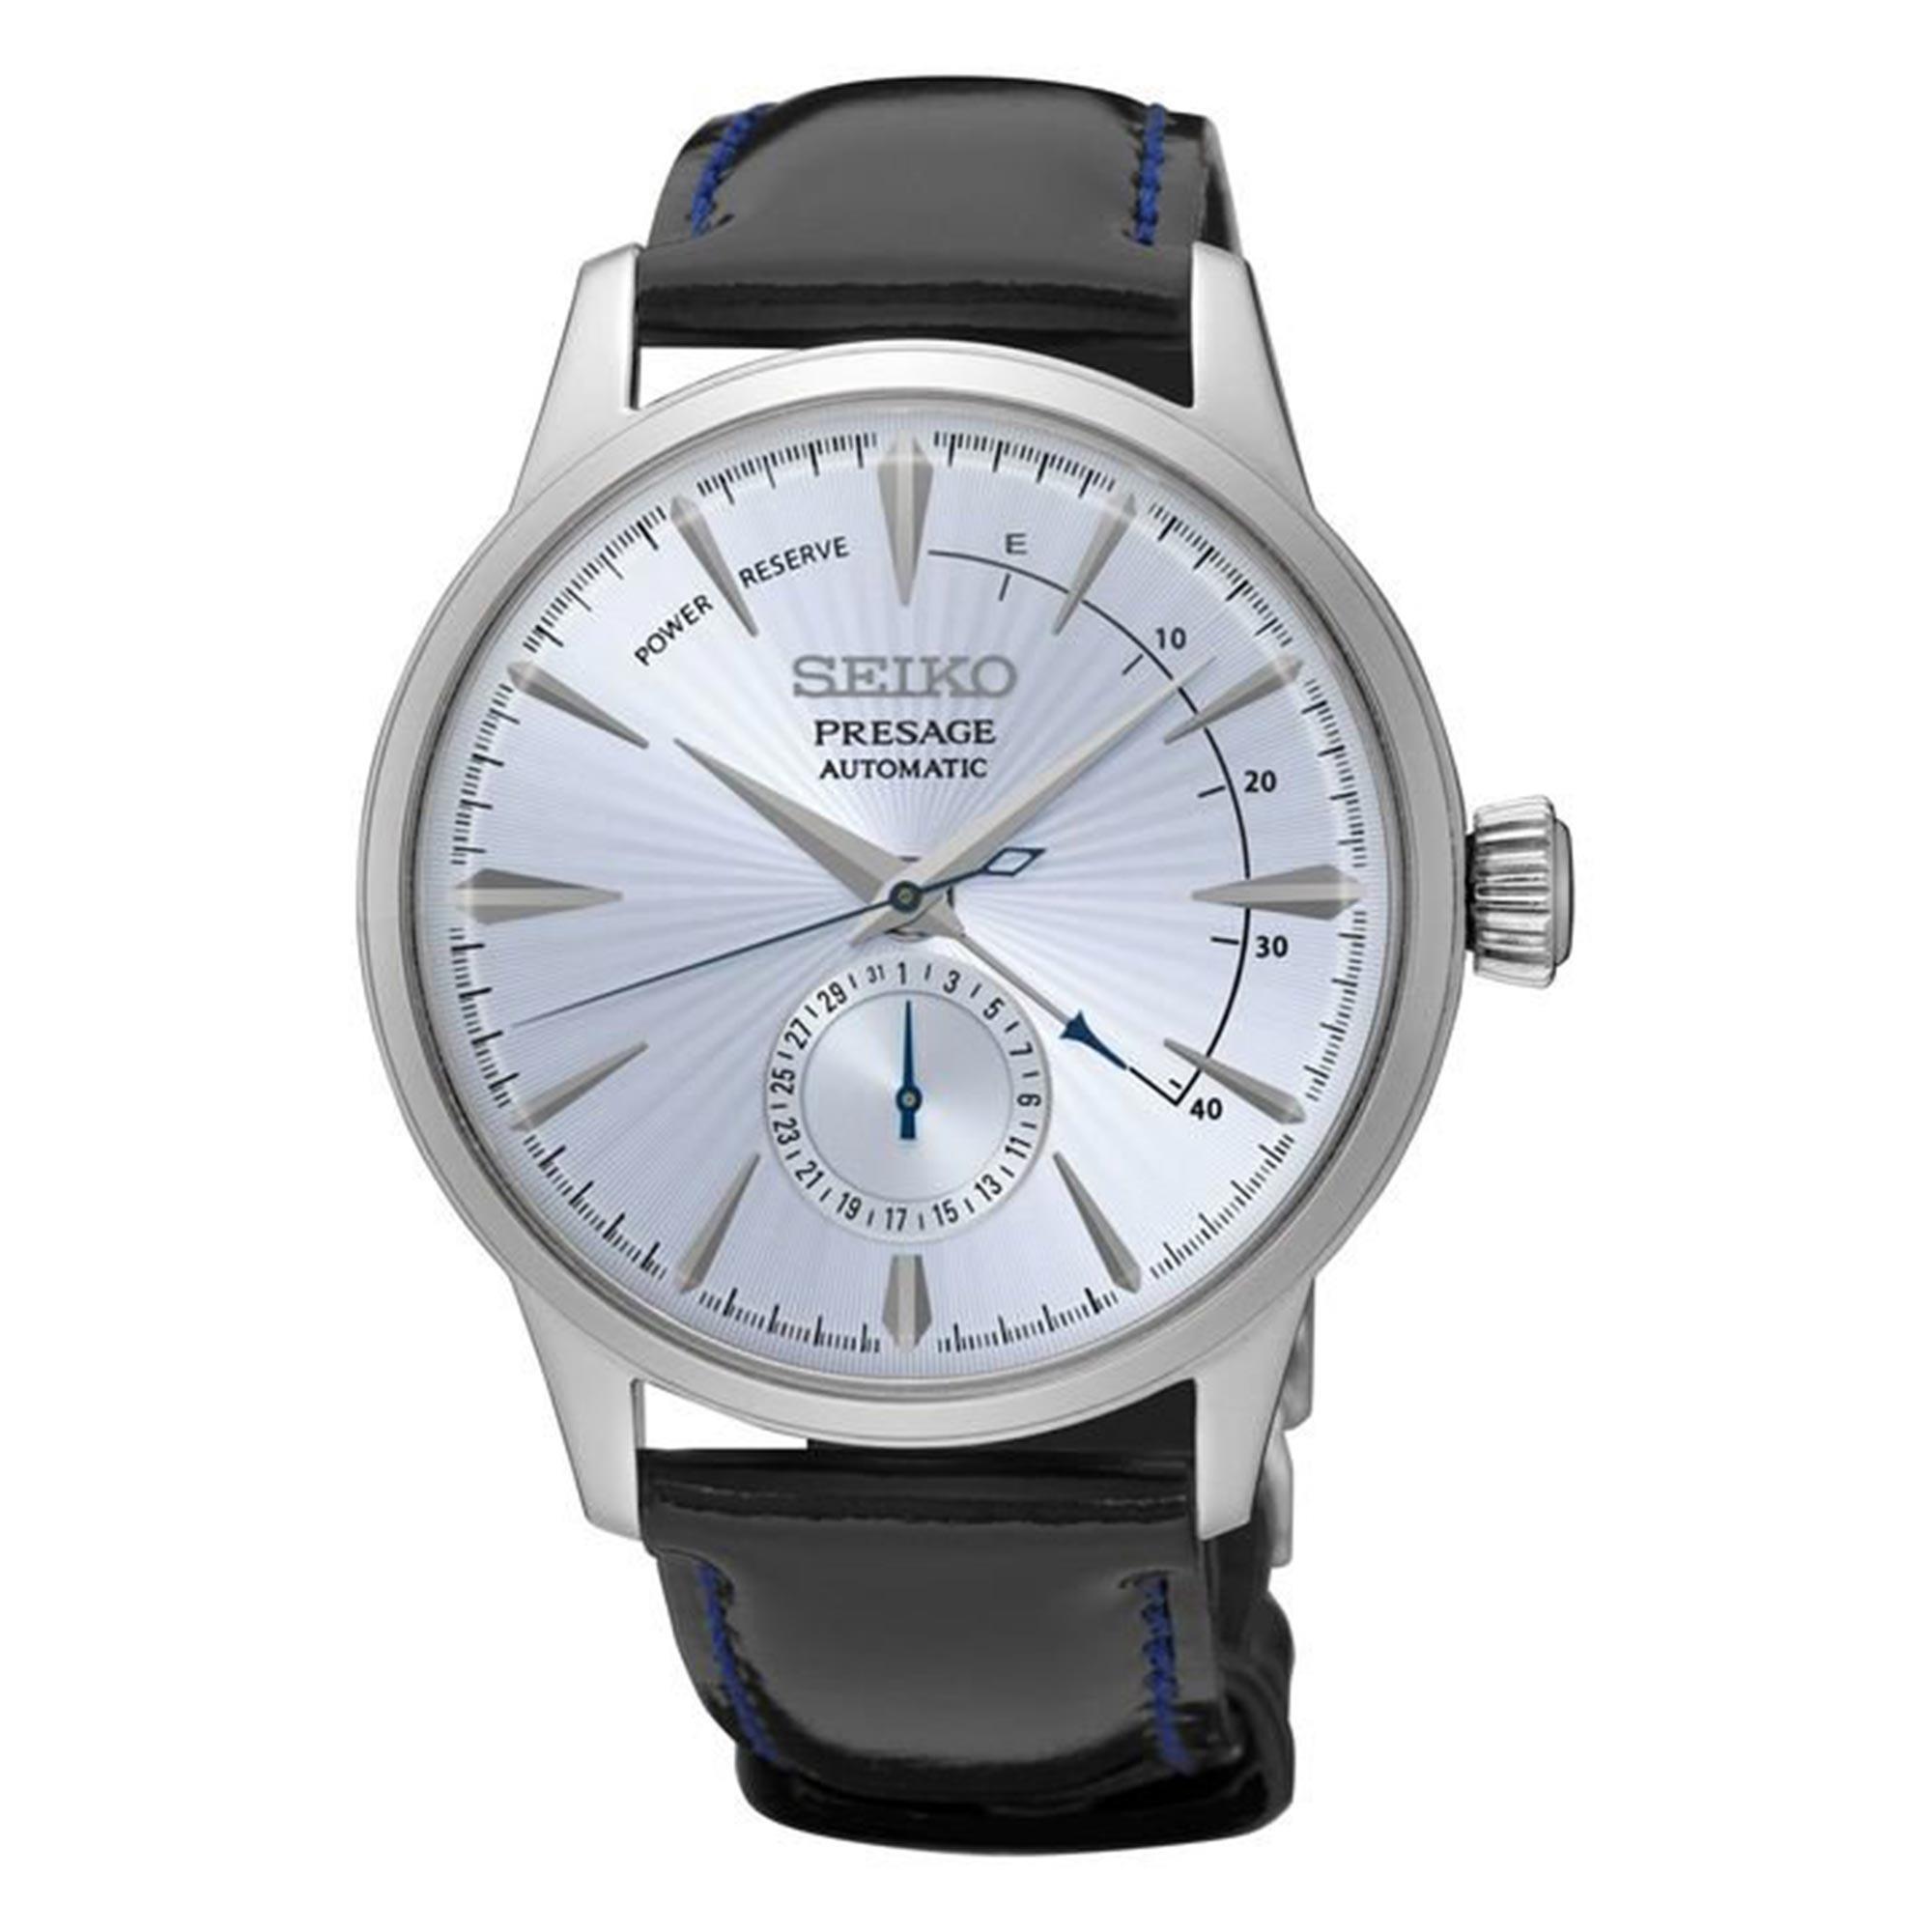 Seiko Presage Cocktail Time Automatic Silver Dial Black Leather Strap Men's Watch SSA343J1 RRP £399